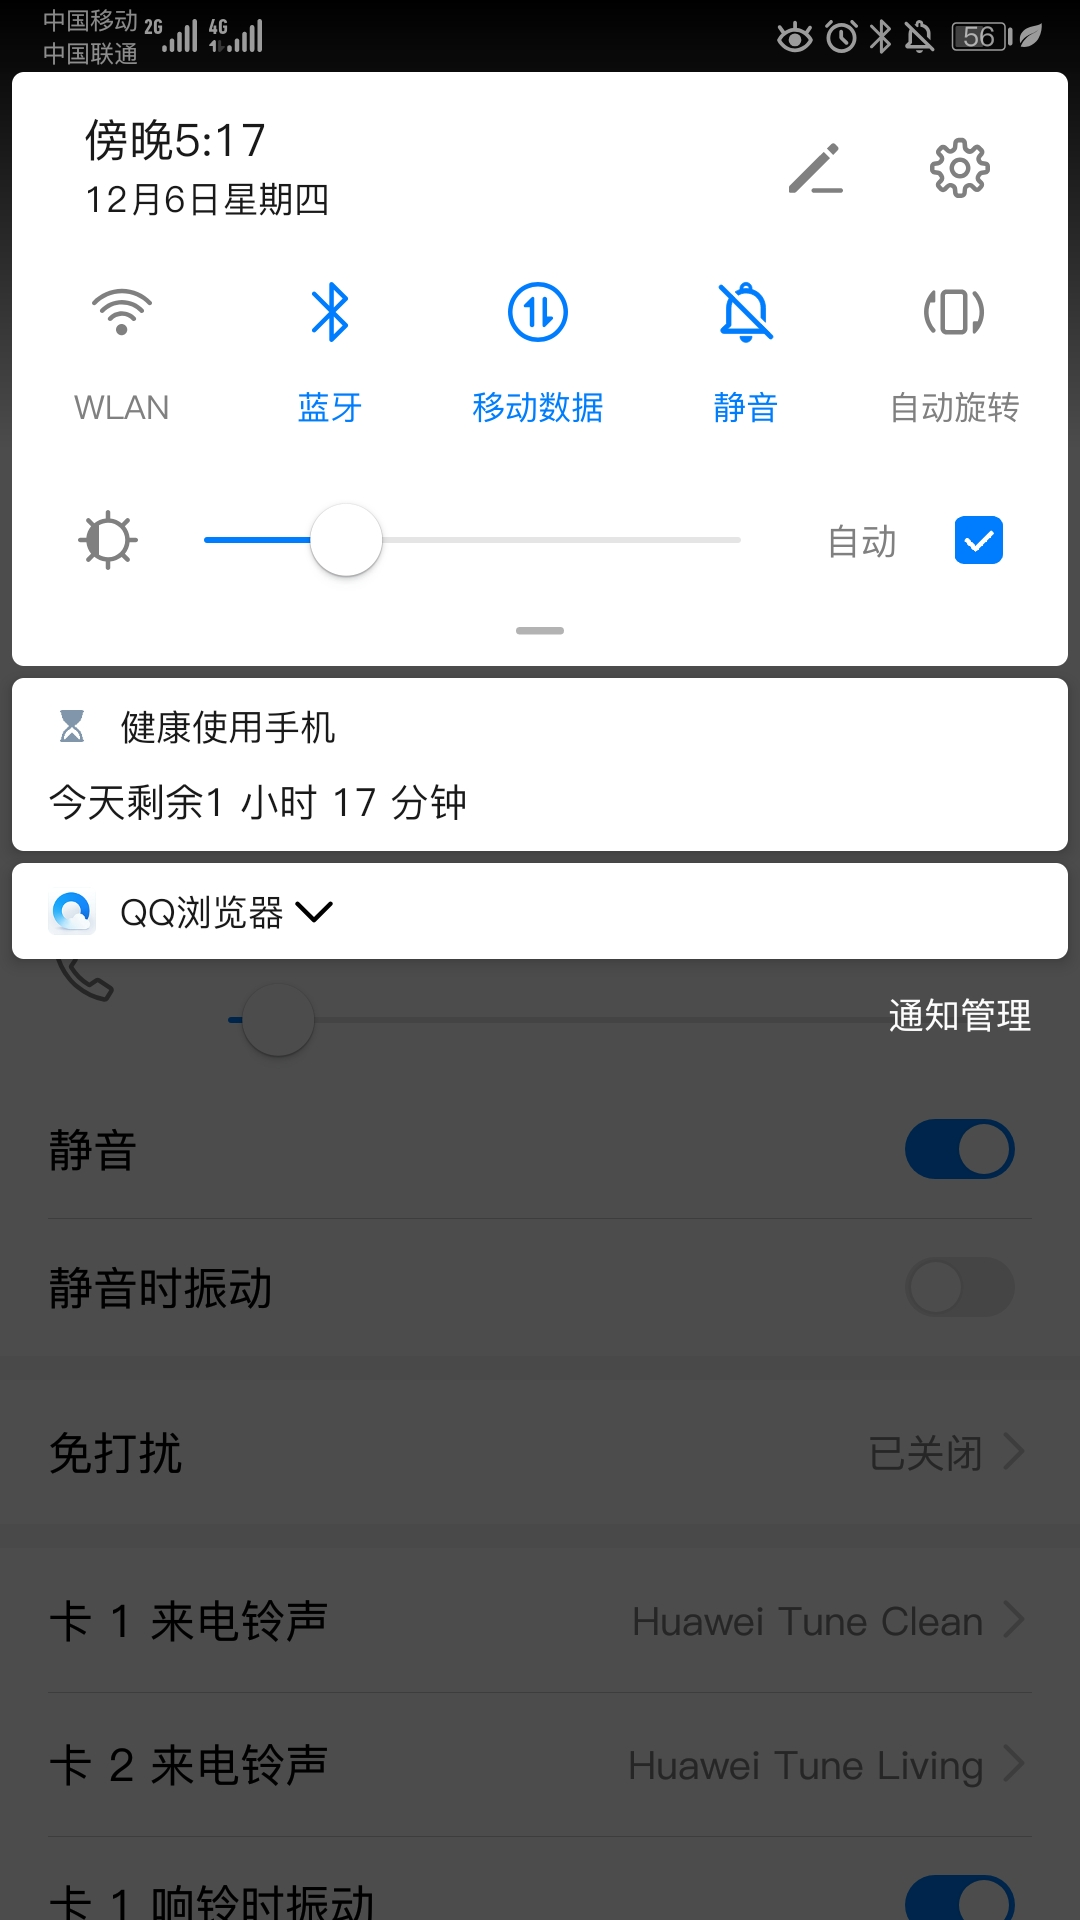 Screenshot_20181206_171719_com.android.settings.jpg